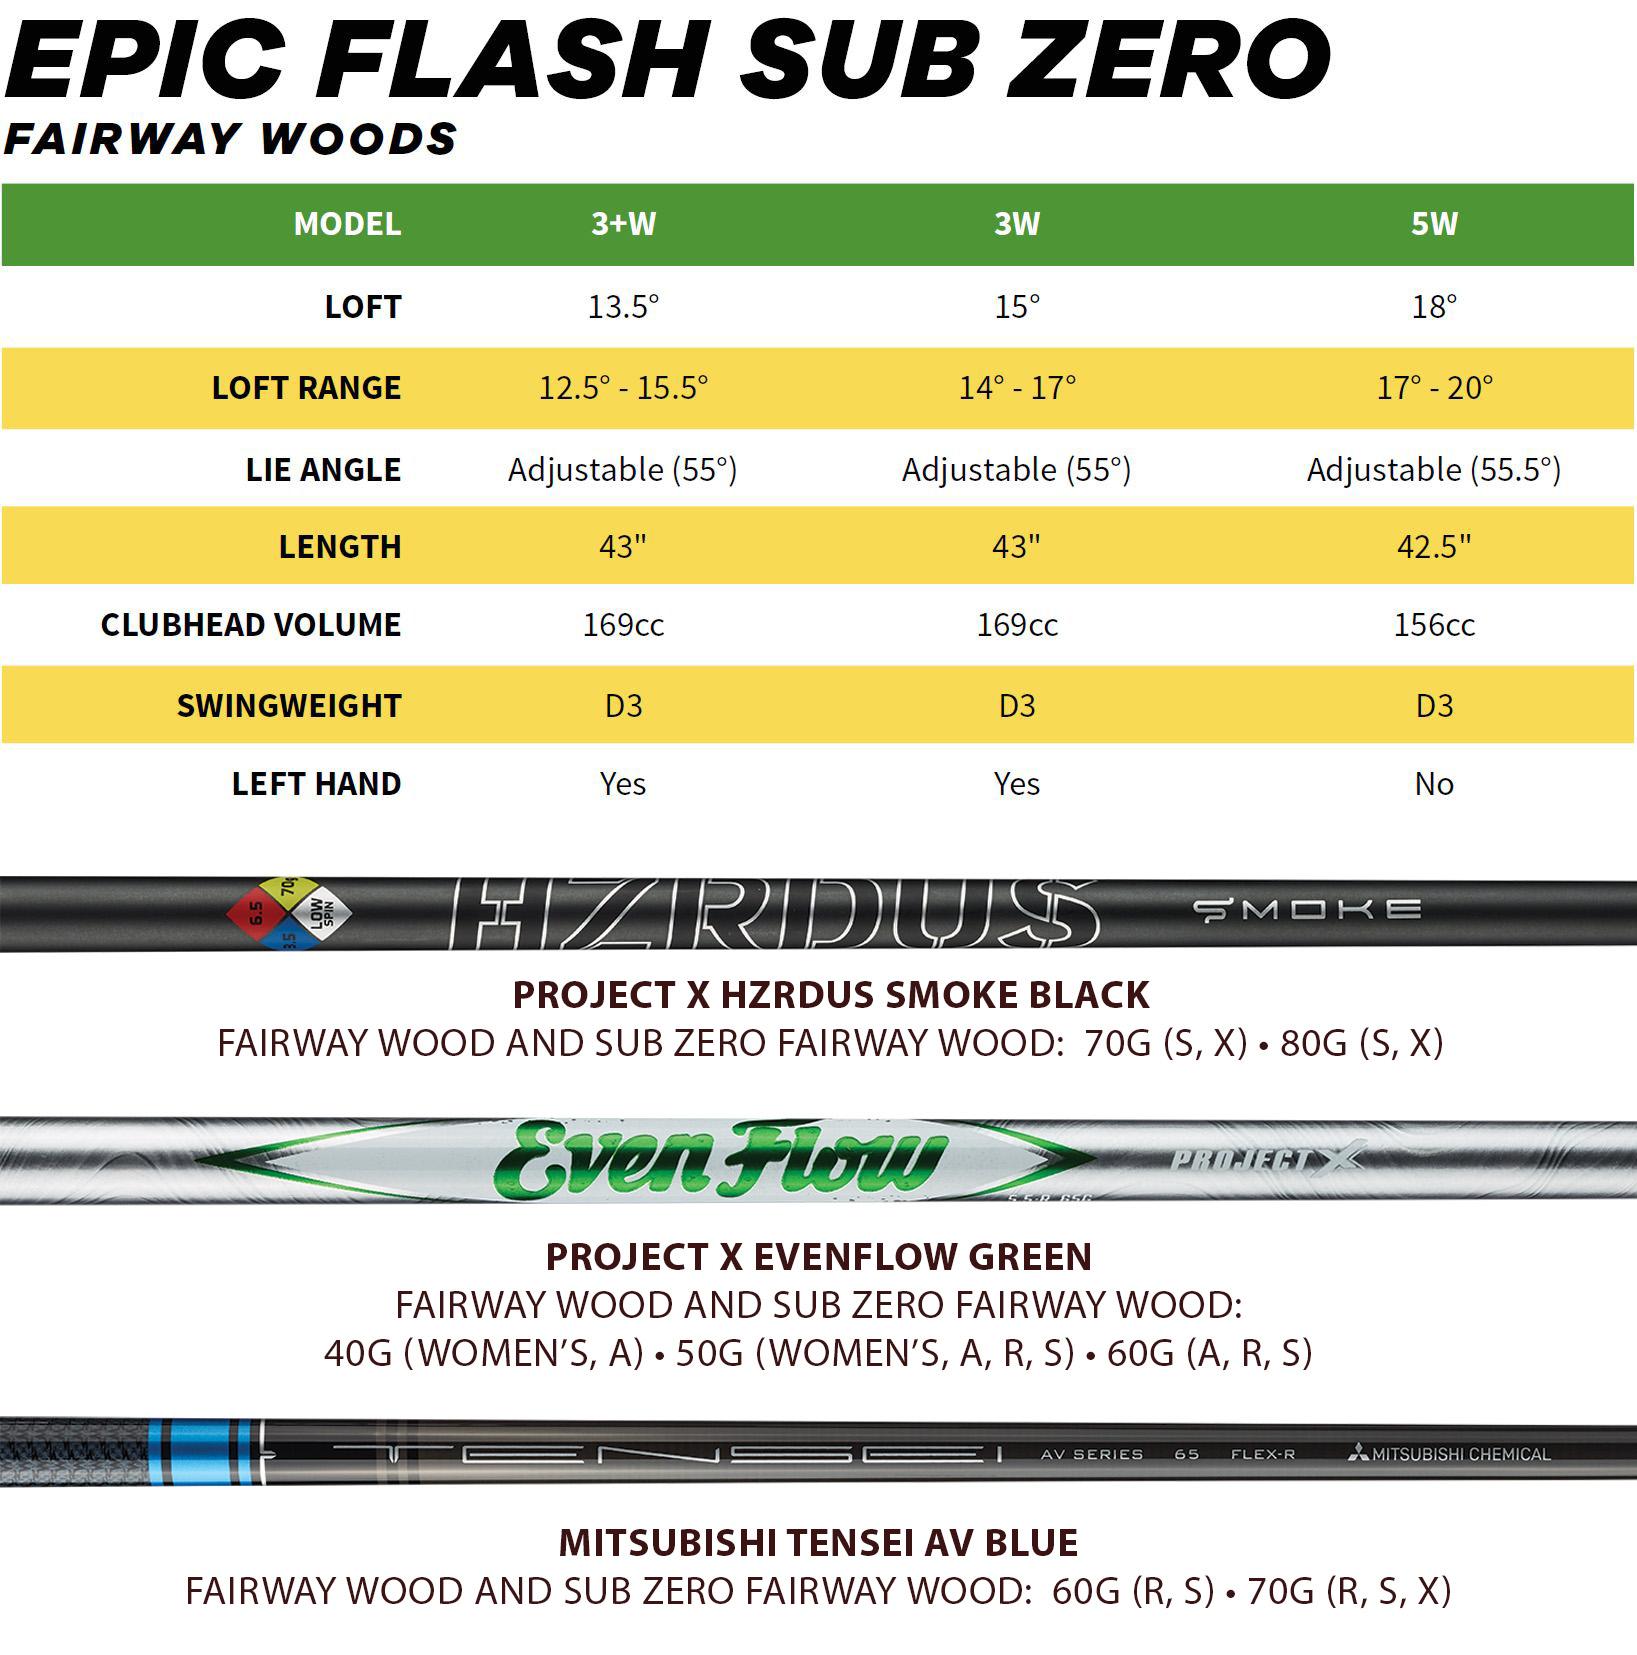 Callawya Epic Flash Sub Zero Fairway Wood Tech Specs